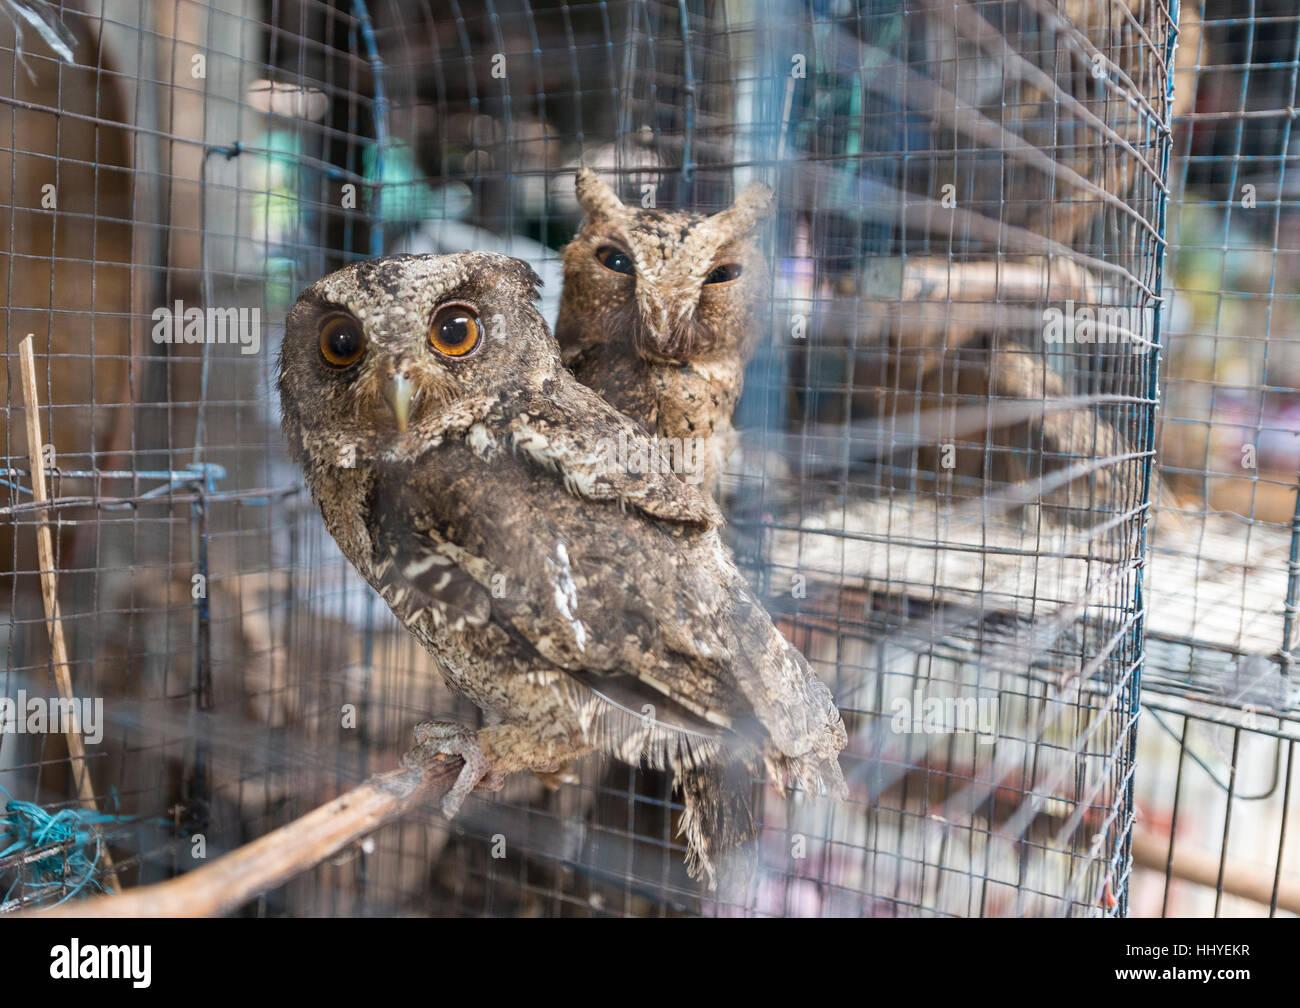 Cage with two owls, bird market, Yogyakarta, Java, Indonesia - Stock Image